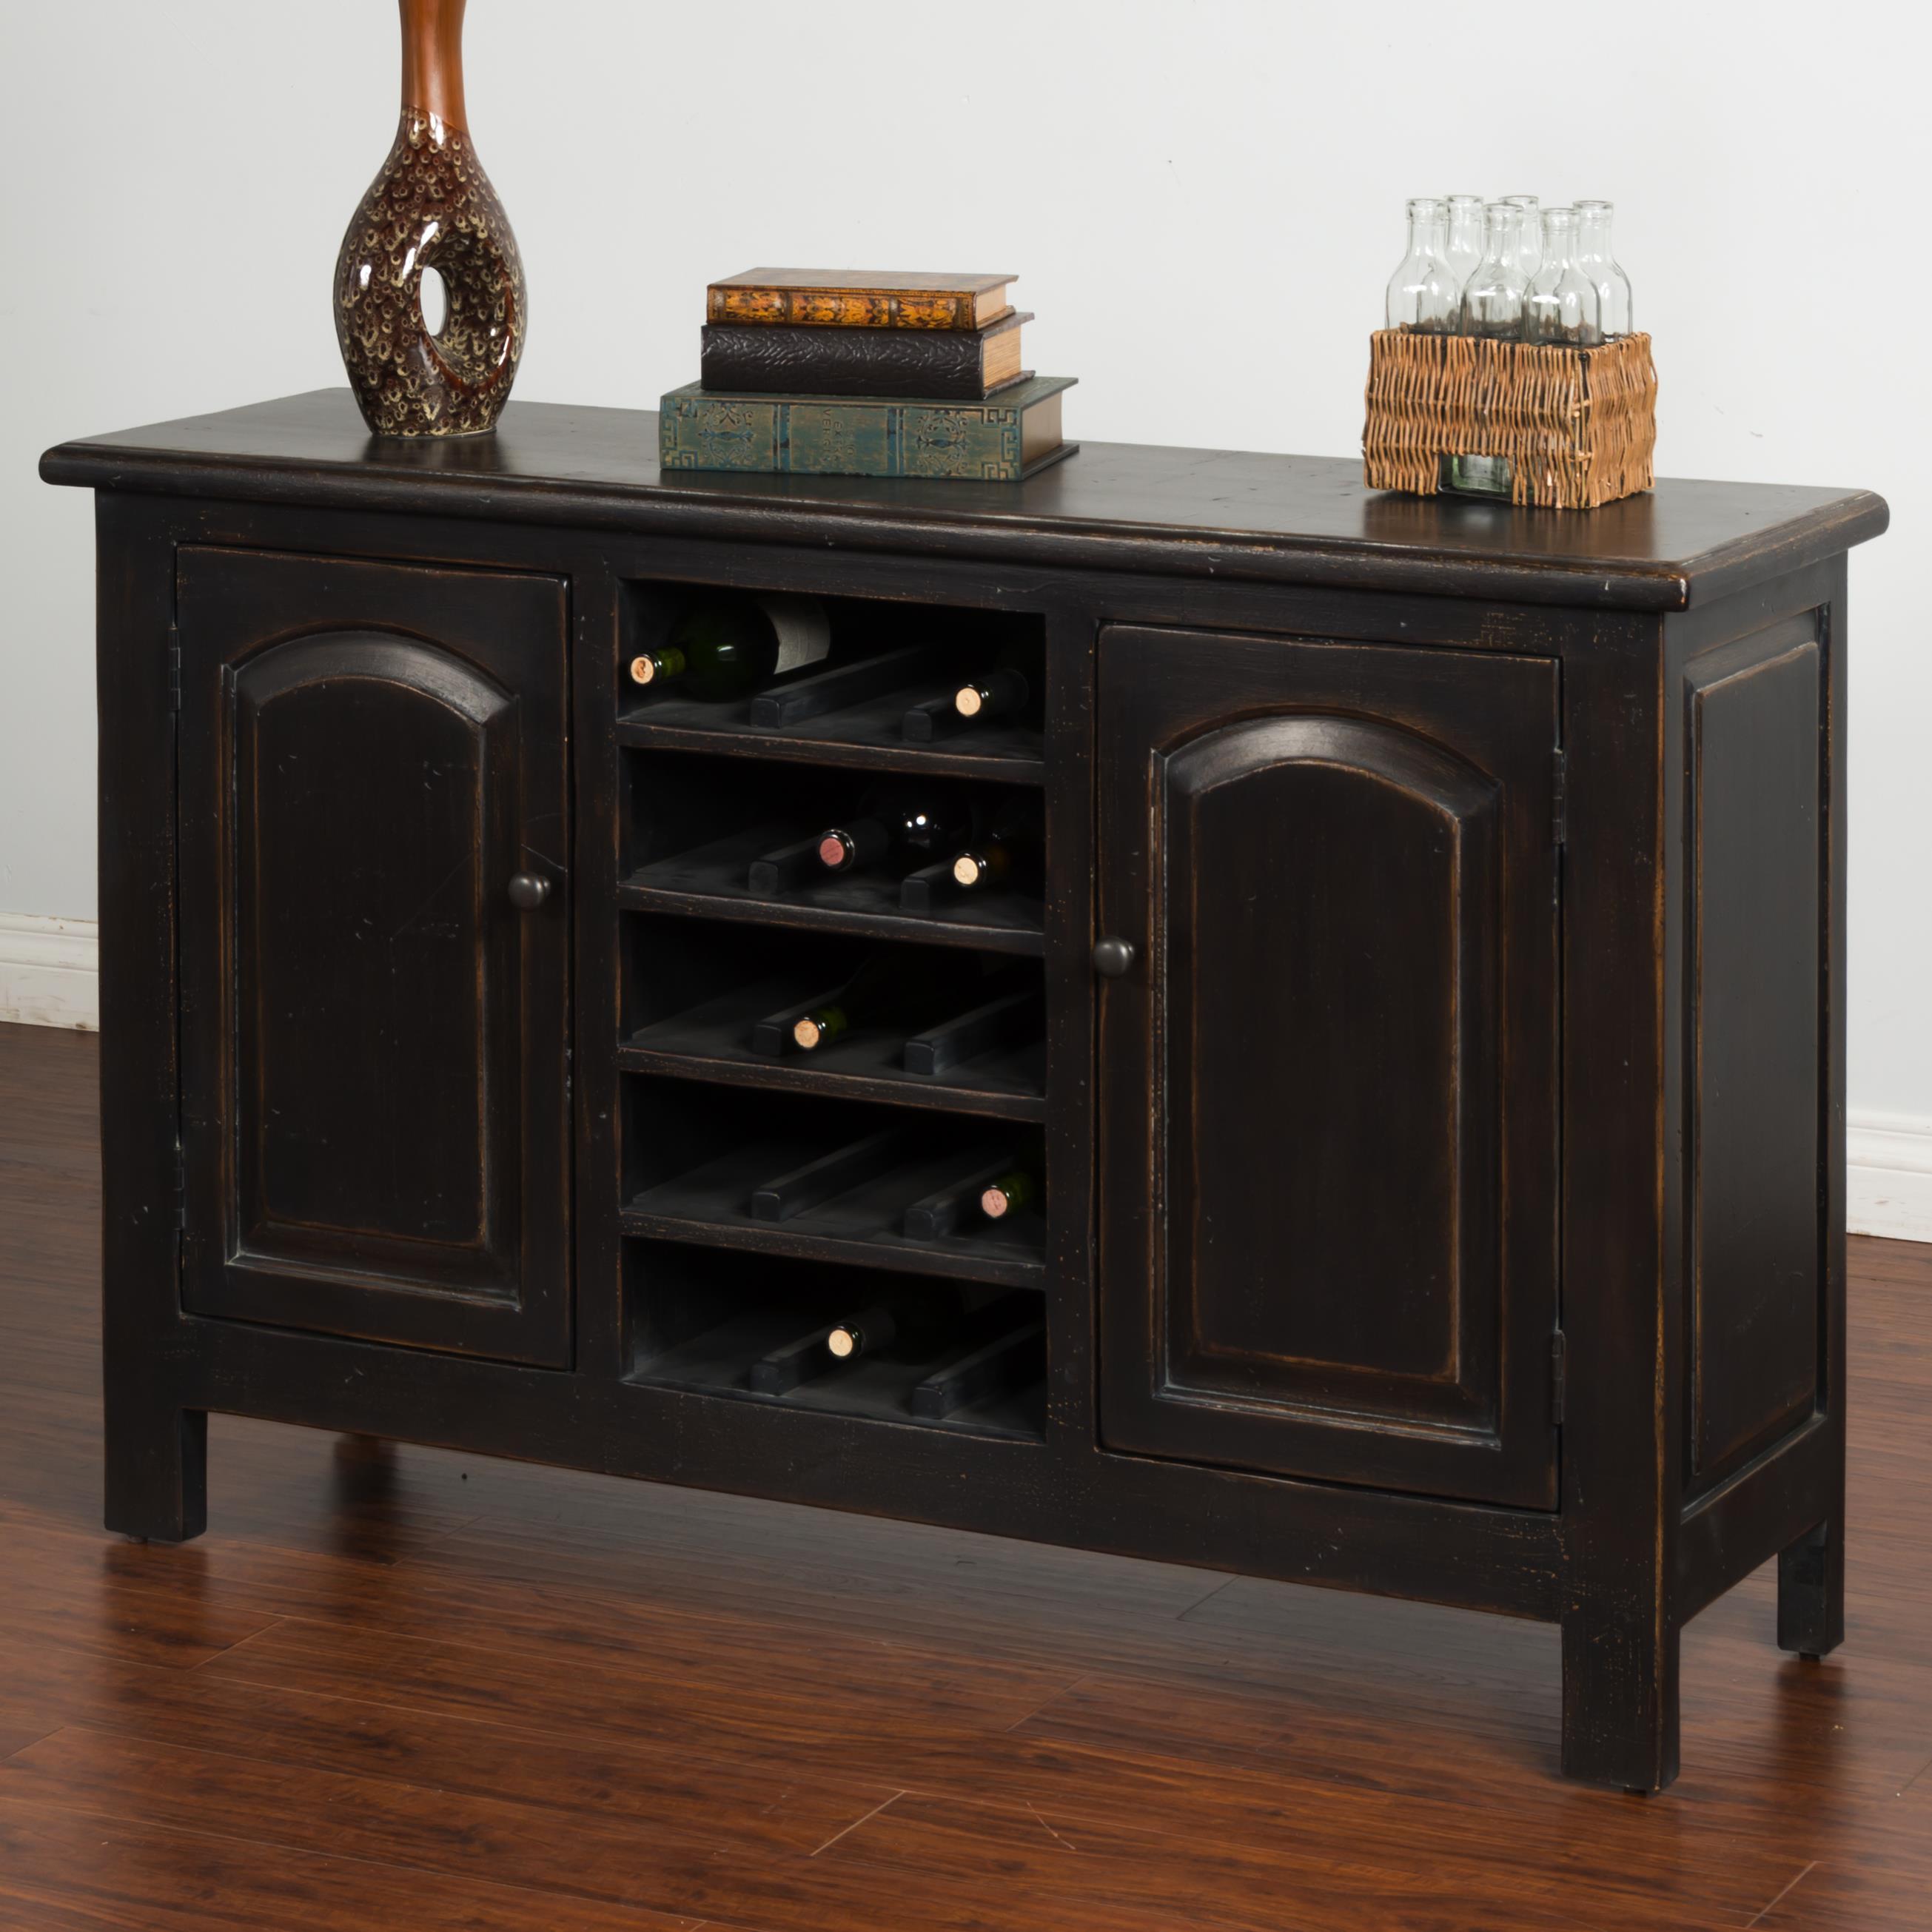 Sunny Designs Black Sideboard w/ Wine Storage - Item Number: 2271B-SB